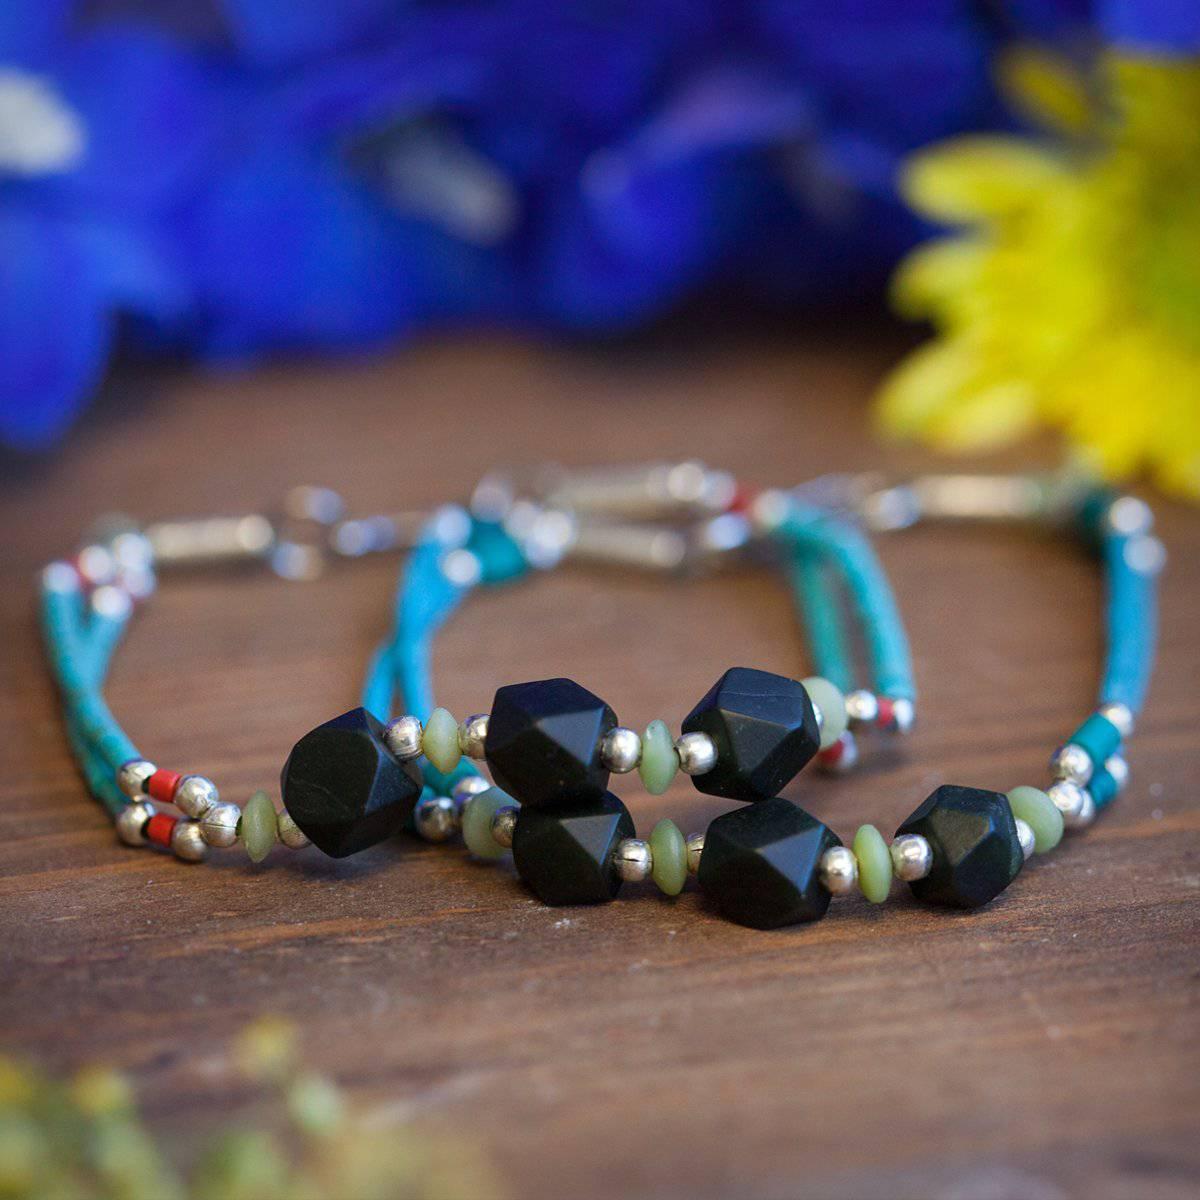 Abundance Bracelets & Ad Ripa Perfume 2_13 DD Secondary